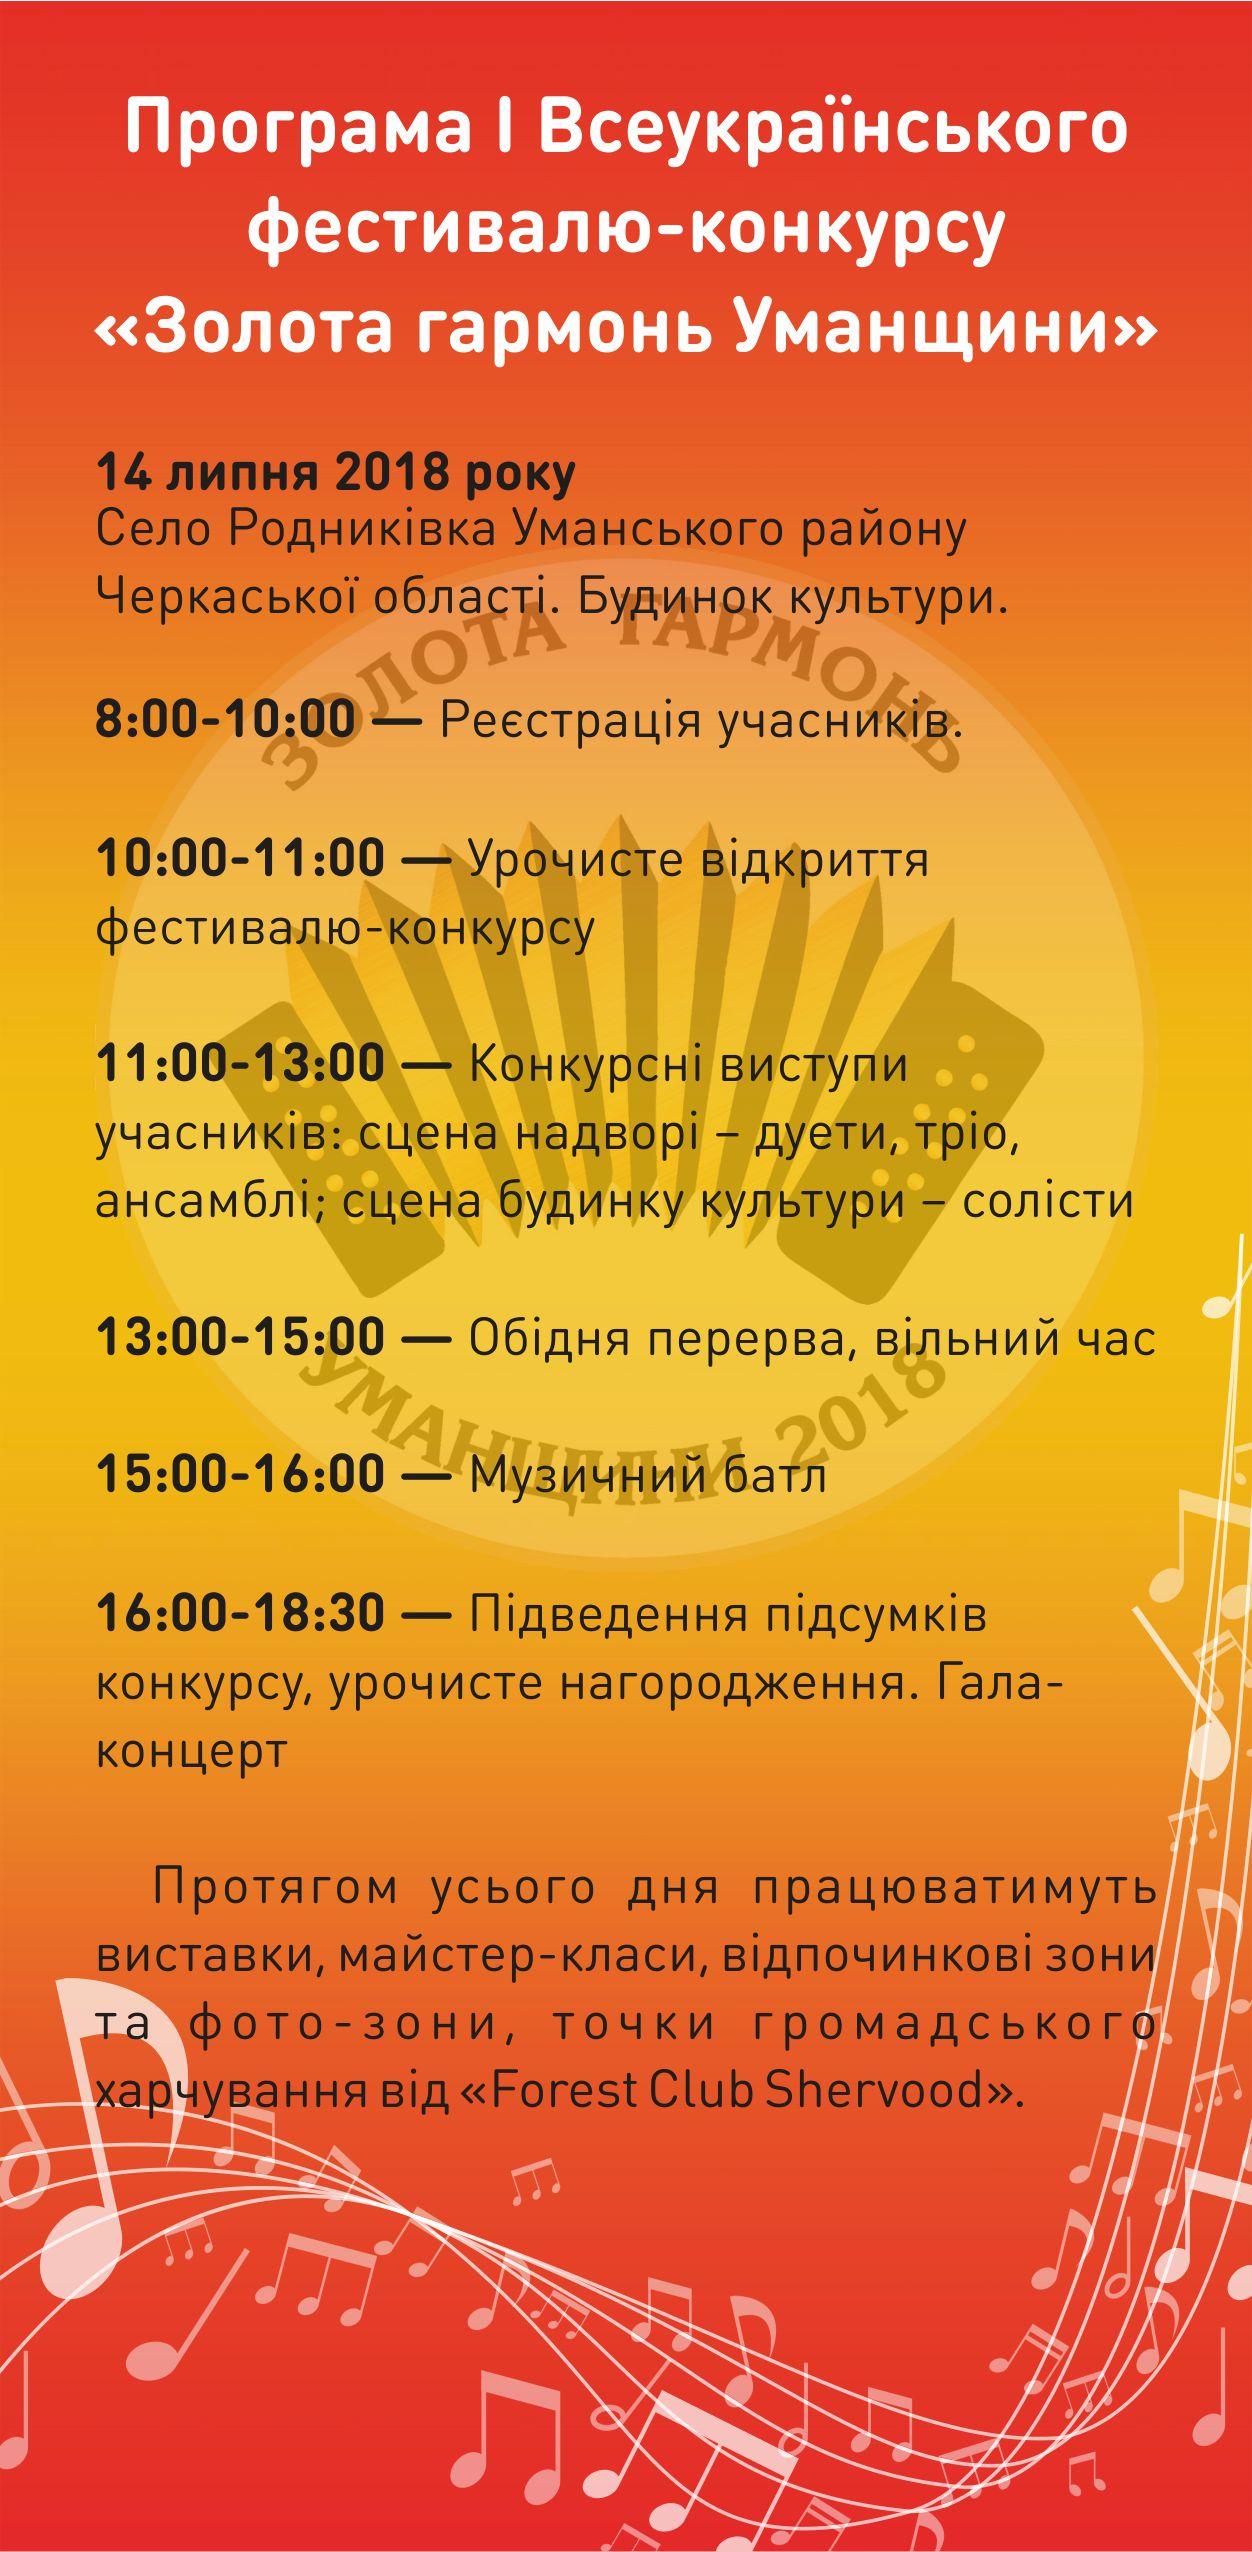 Запрошуємо на І-й Всеукраїнський фестиваль-конкурс «Золота гармонь Уманщини»!